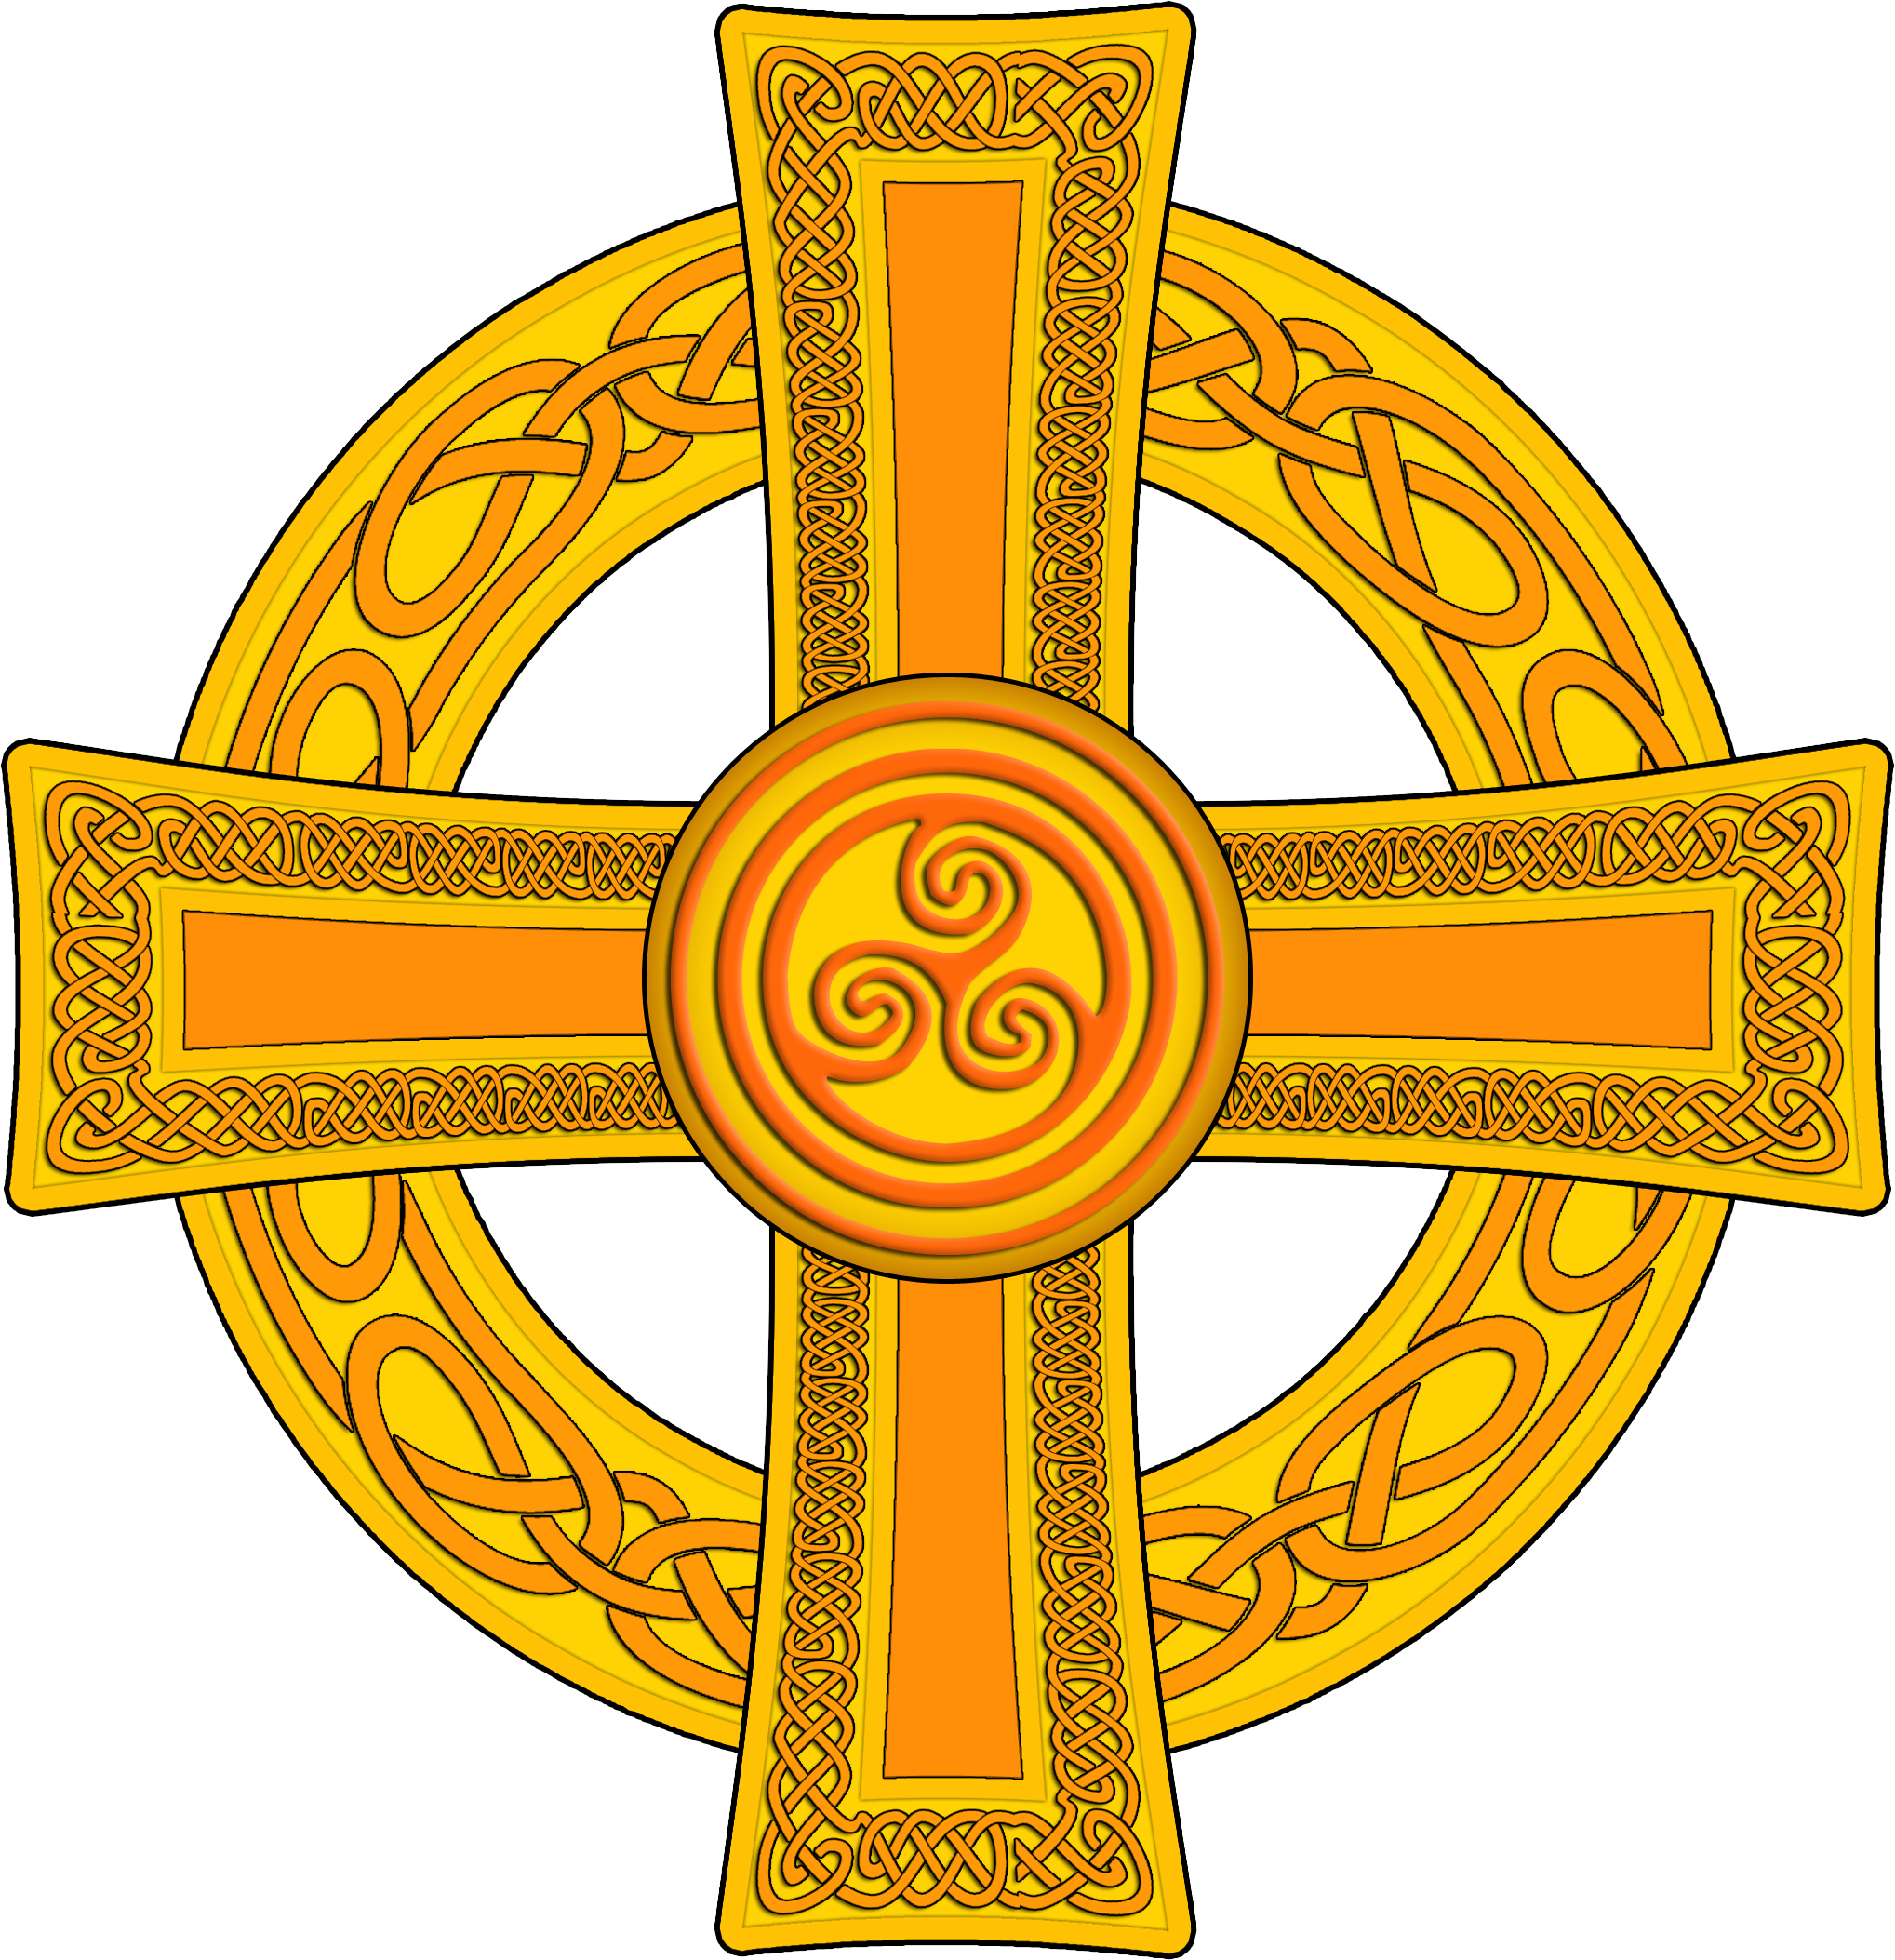 Untitled document celtic cross. Warrior clipart celt